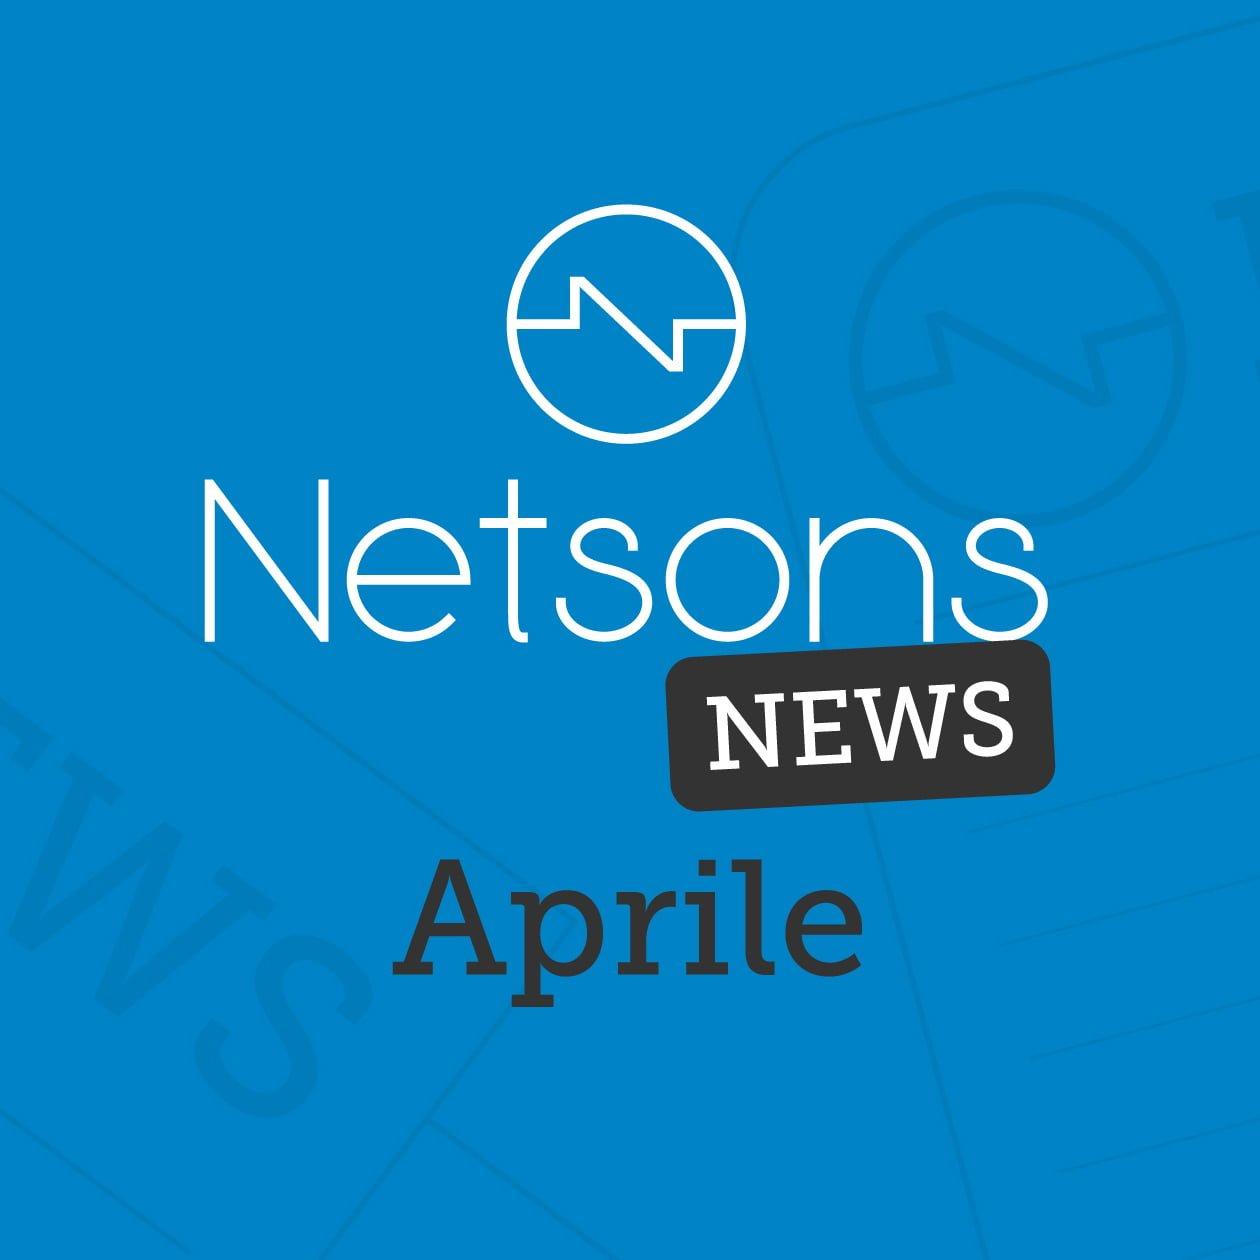 aprile news